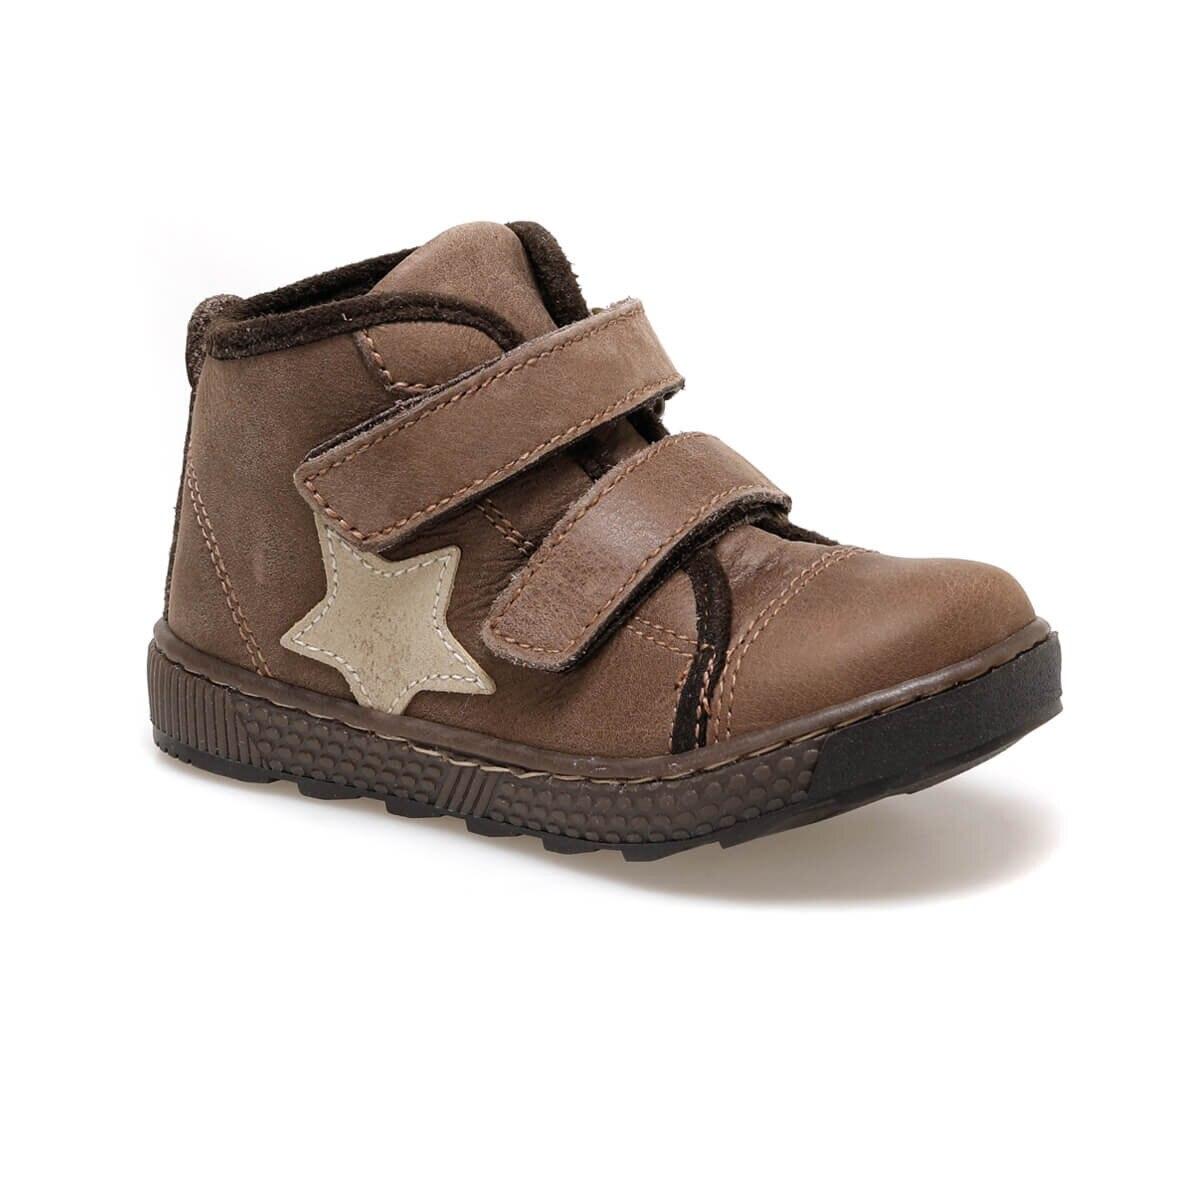 FLO 2428 D4 Brown Male Child Boots Kifidis